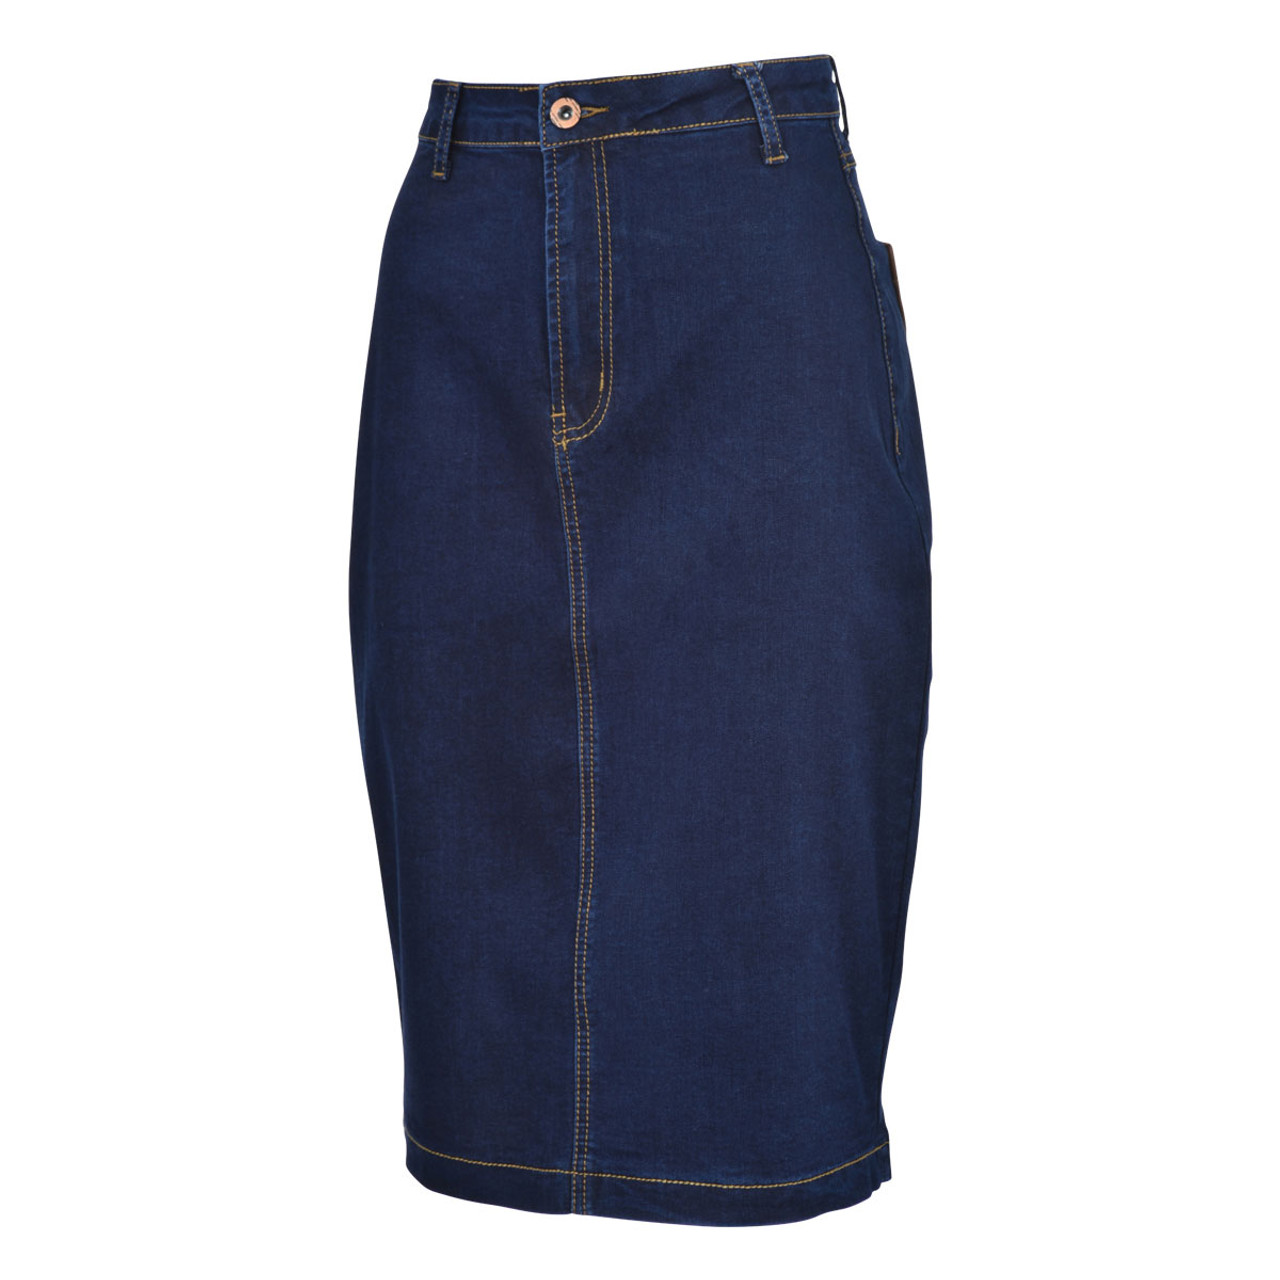 770263483e BGDK Ladies Denim Pencil Skirt With Back Pockets - Double Header USA